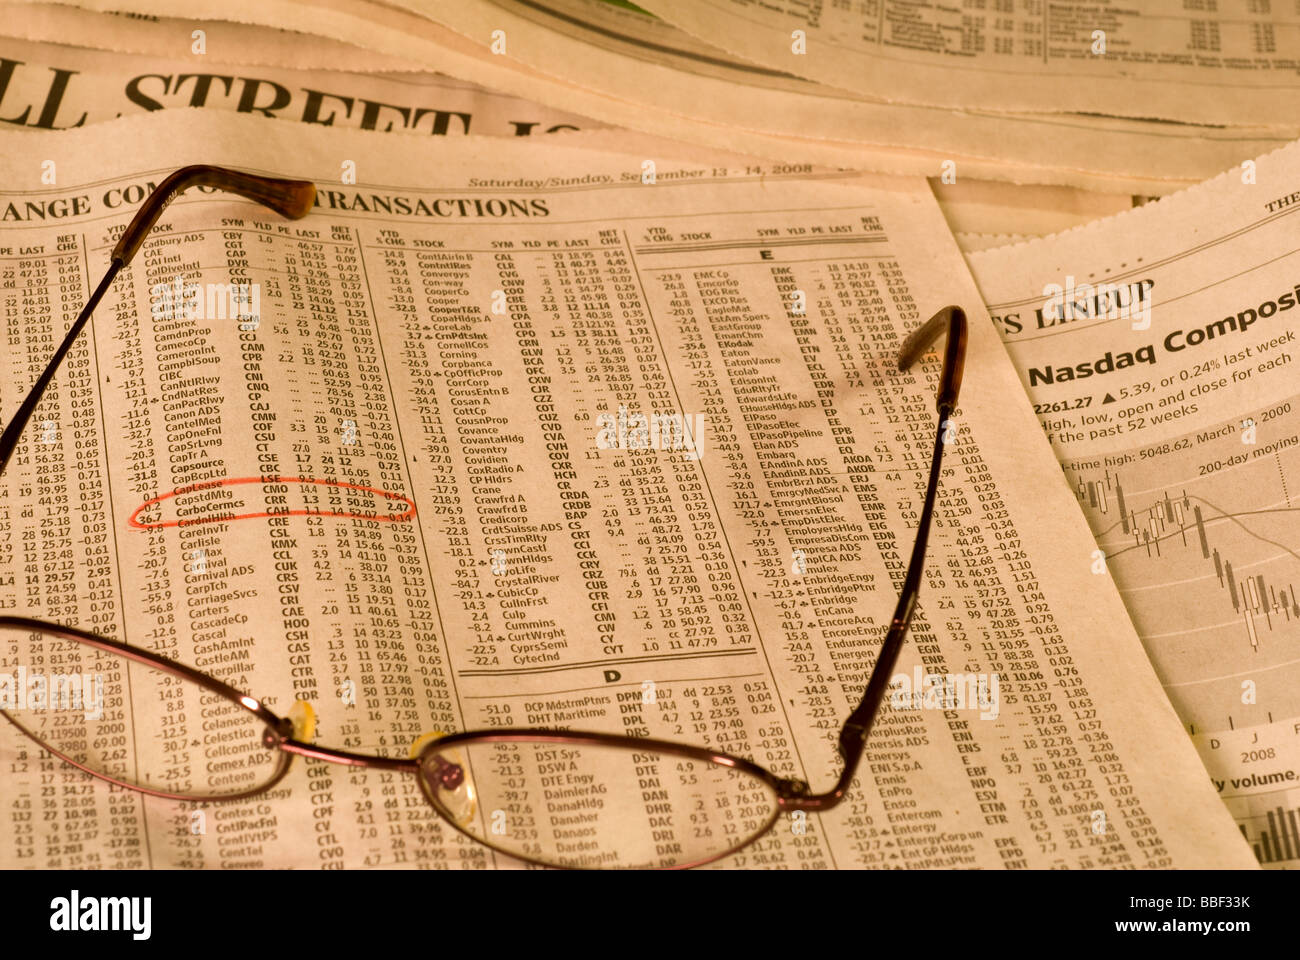 Wall Street Journal, a financial newspaper - Stock Image